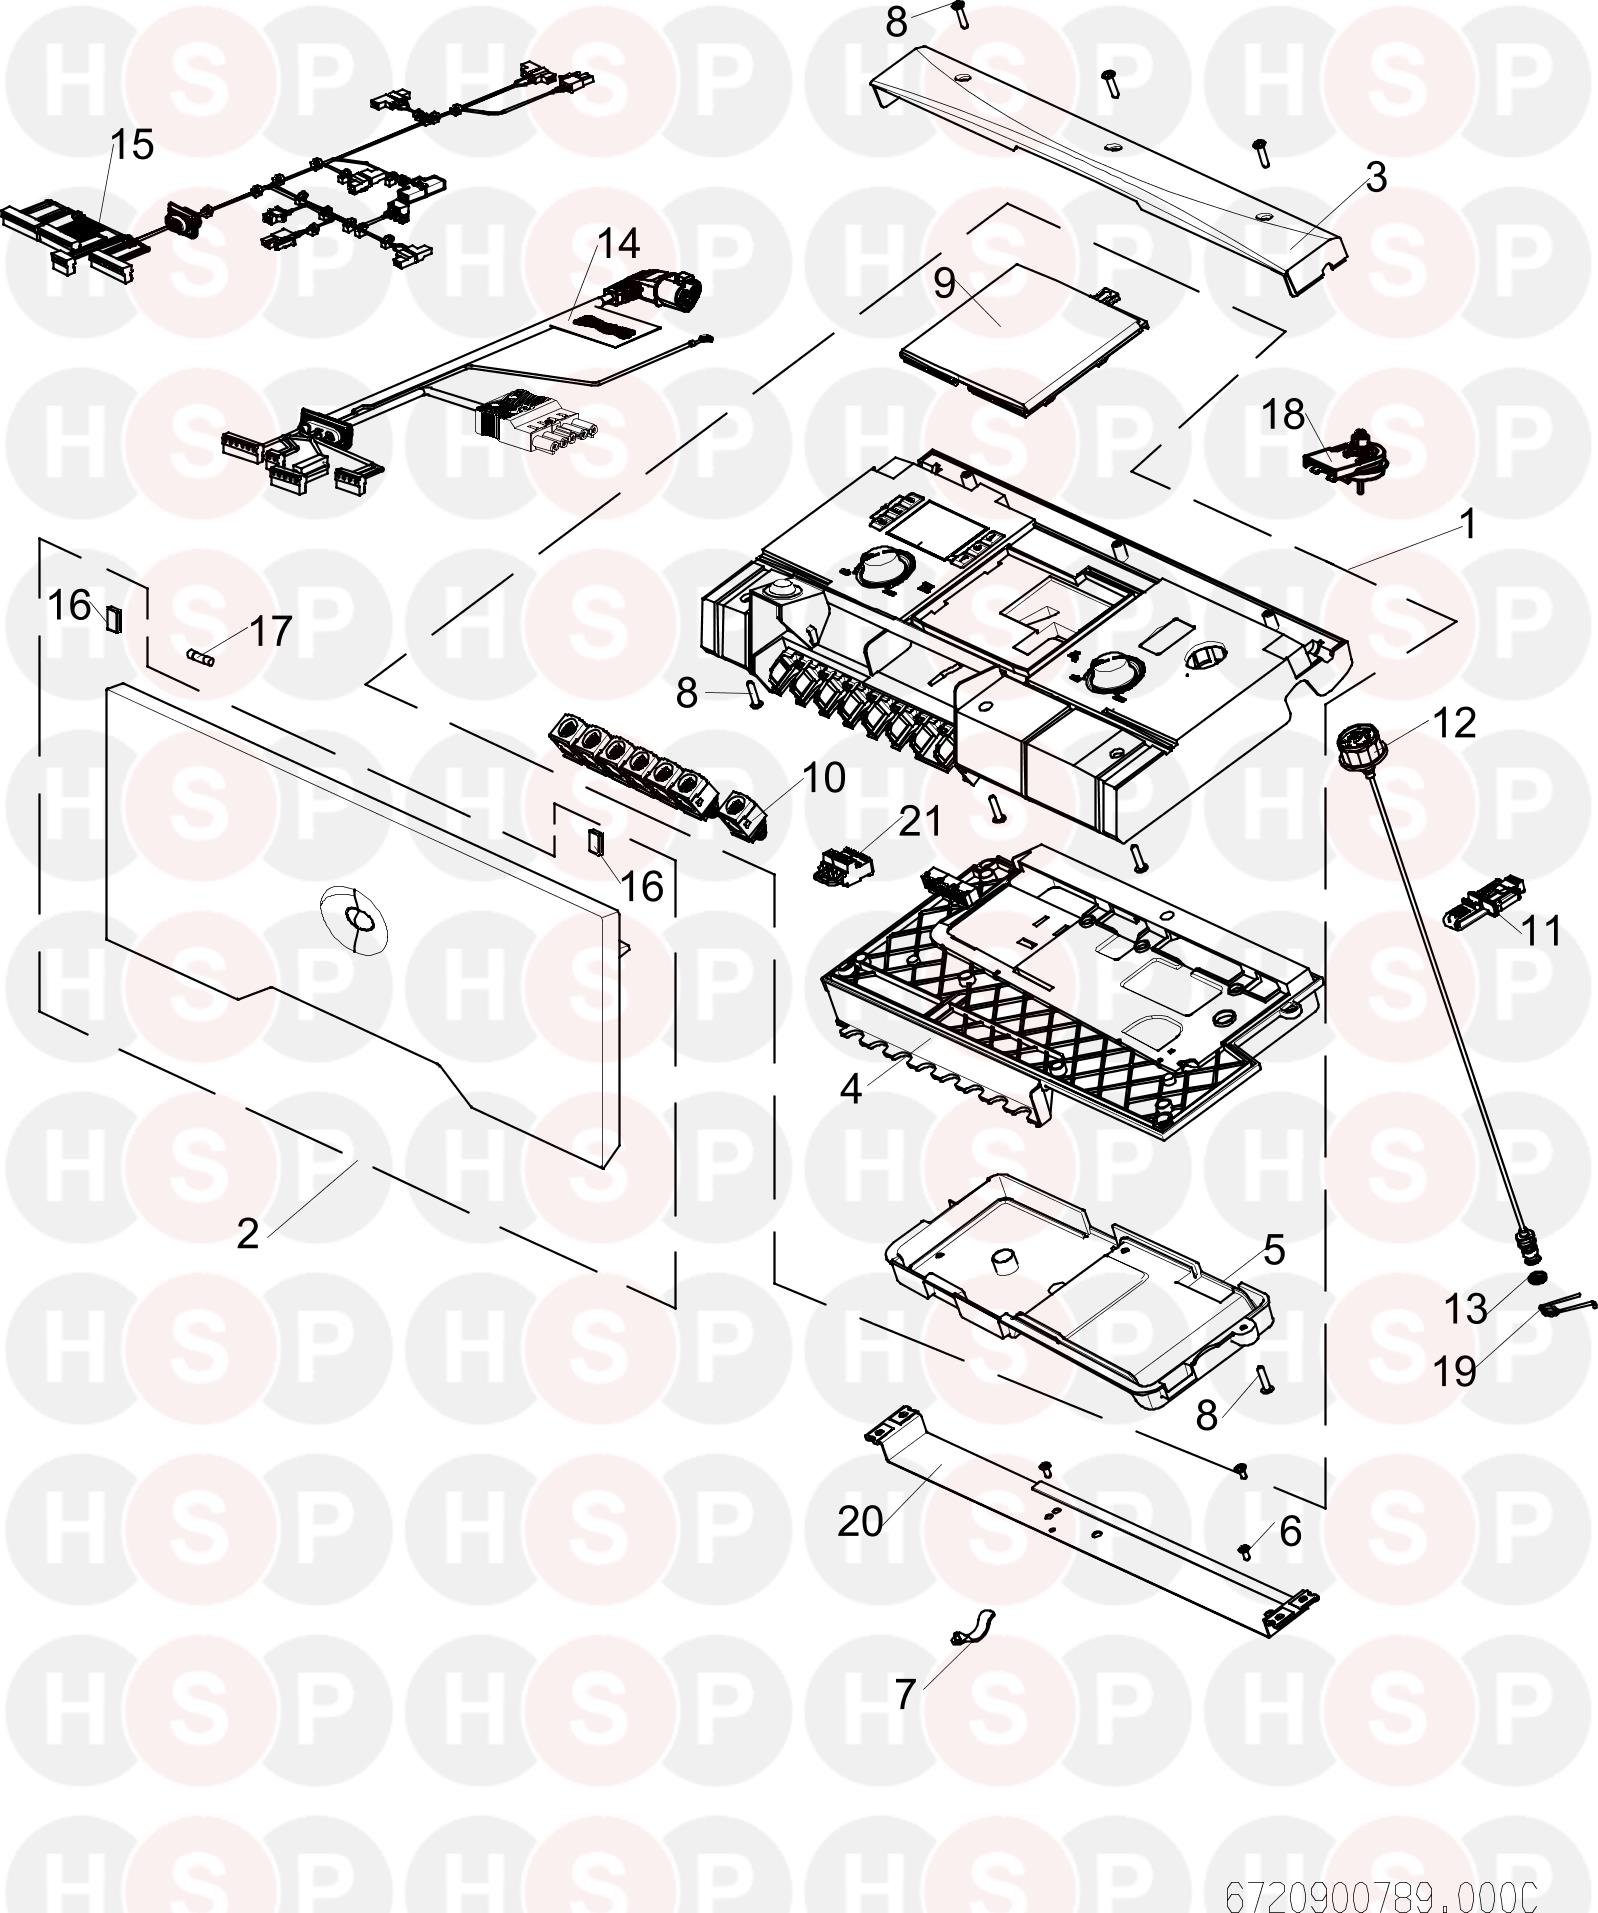 worcester heatslave ii 25 32 control box diagram. Black Bedroom Furniture Sets. Home Design Ideas